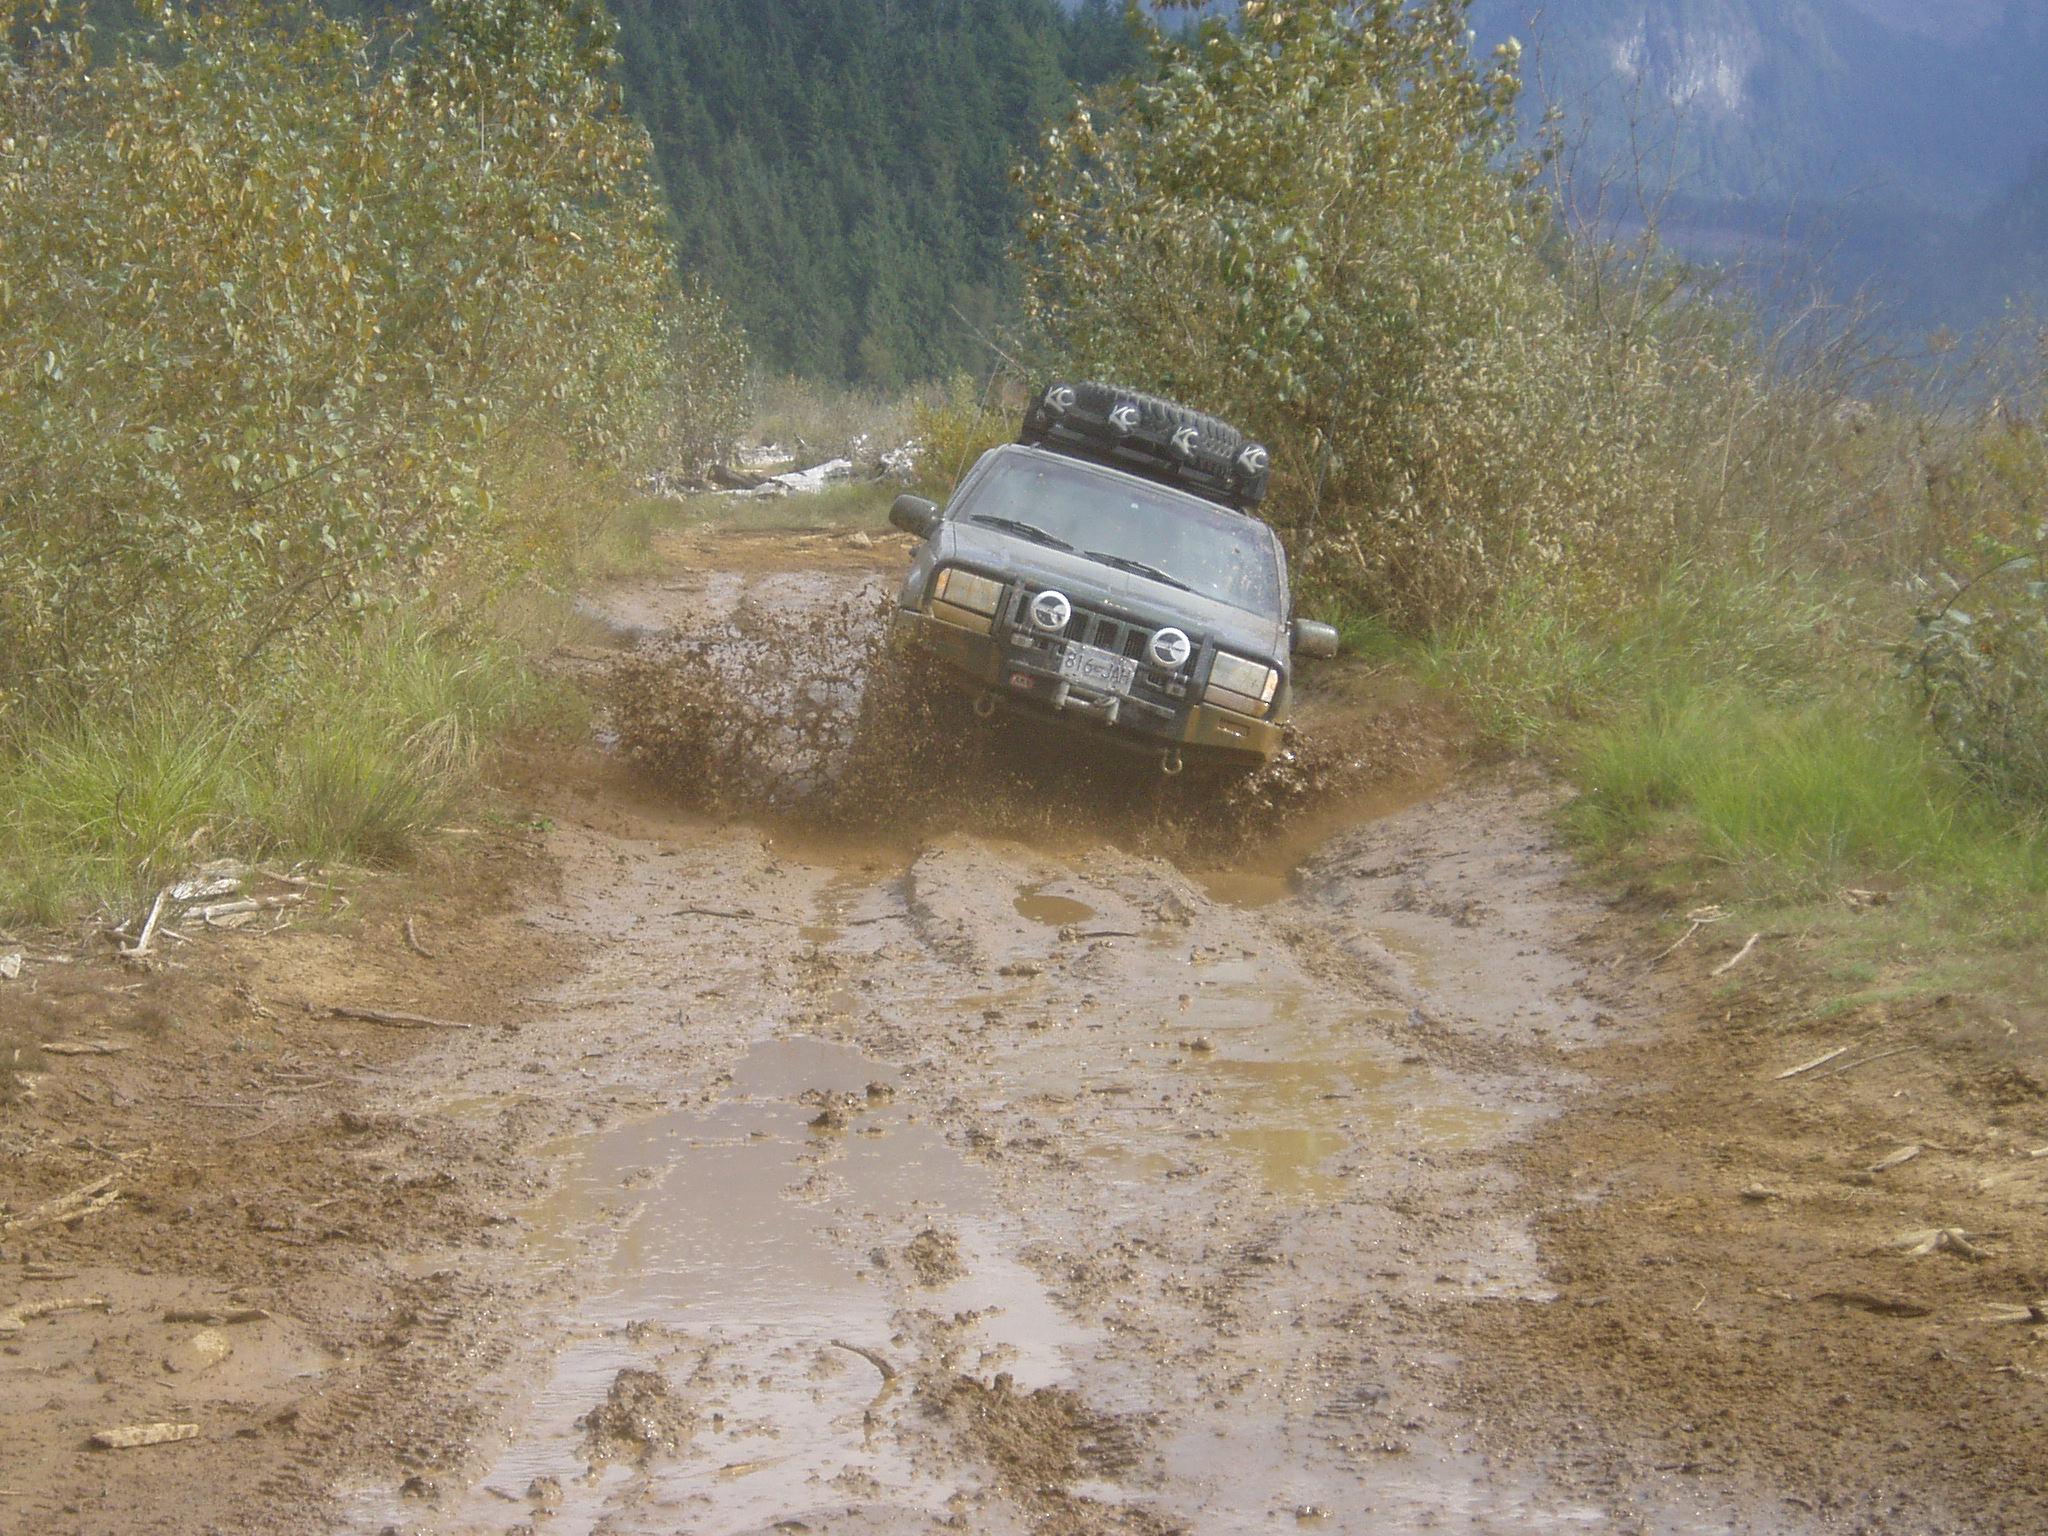 blakes_jeep_012.jpg